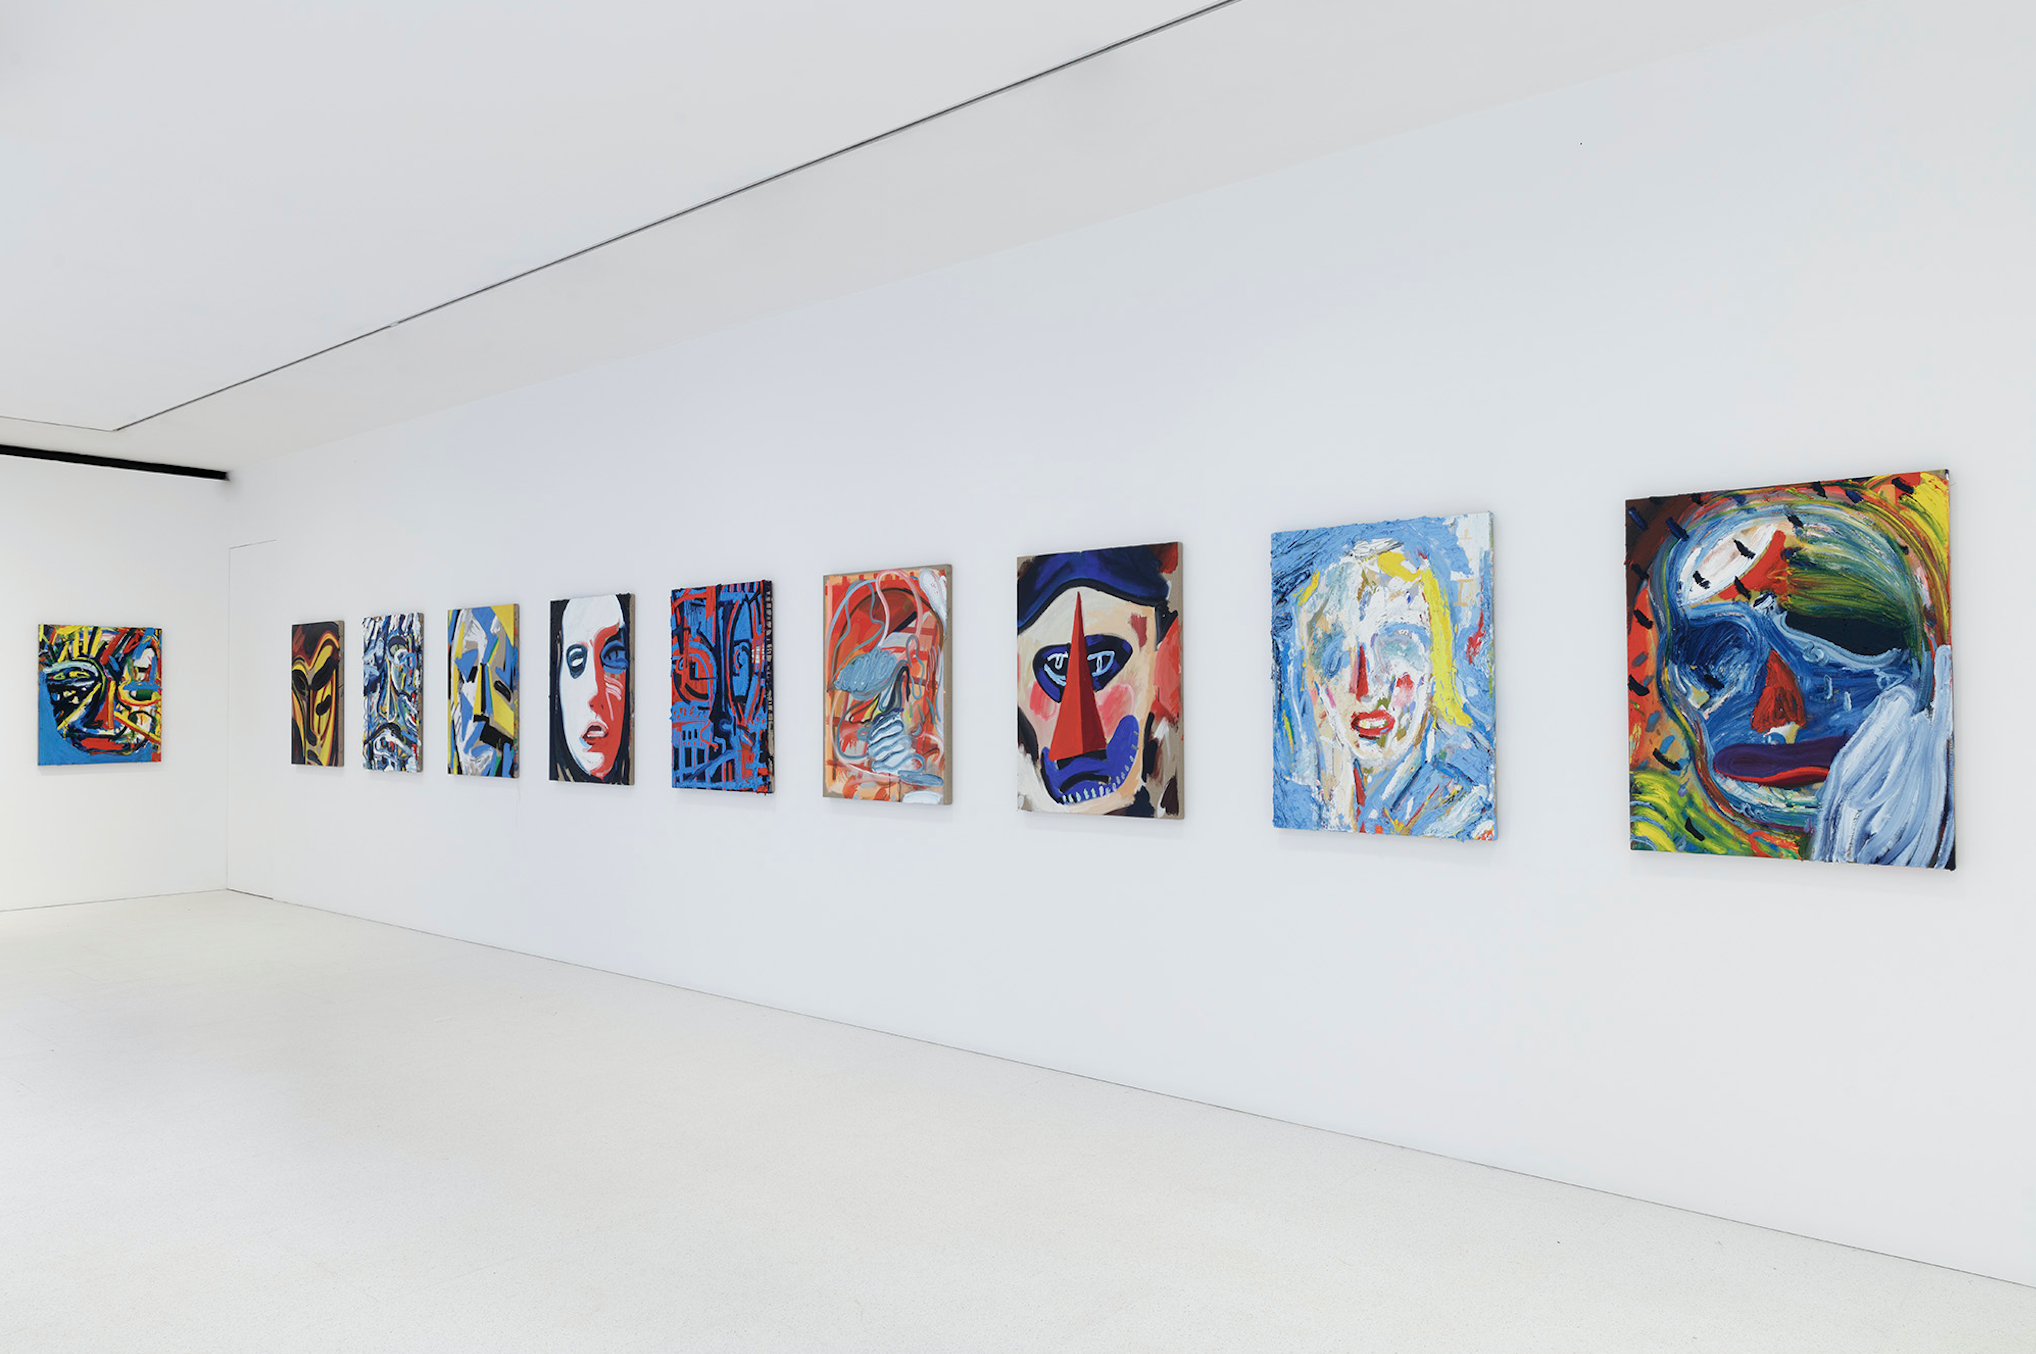 Spencer Sweeney: Queue, installation view, 2021 © Spencer Sweeney Photo: Lucy Dawkins Courtesy Gagosian